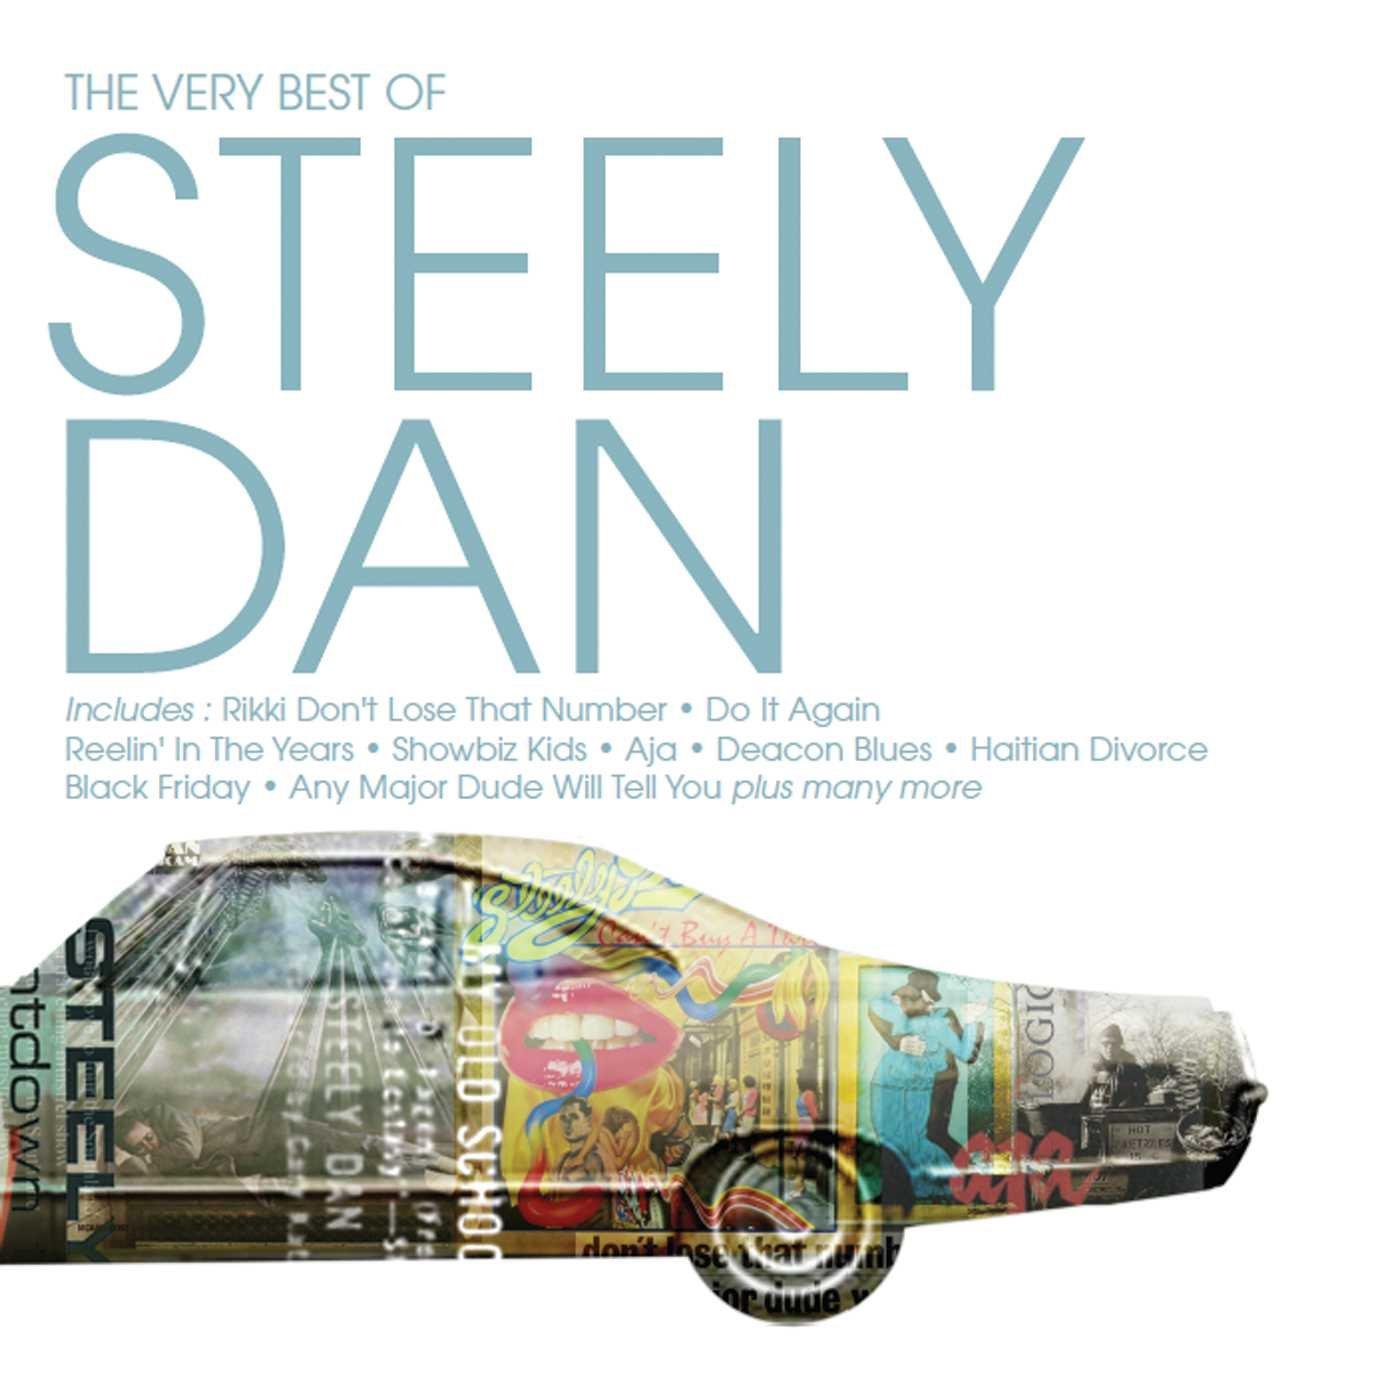 STEELY DAN - Very Best of - Amazon.com Music